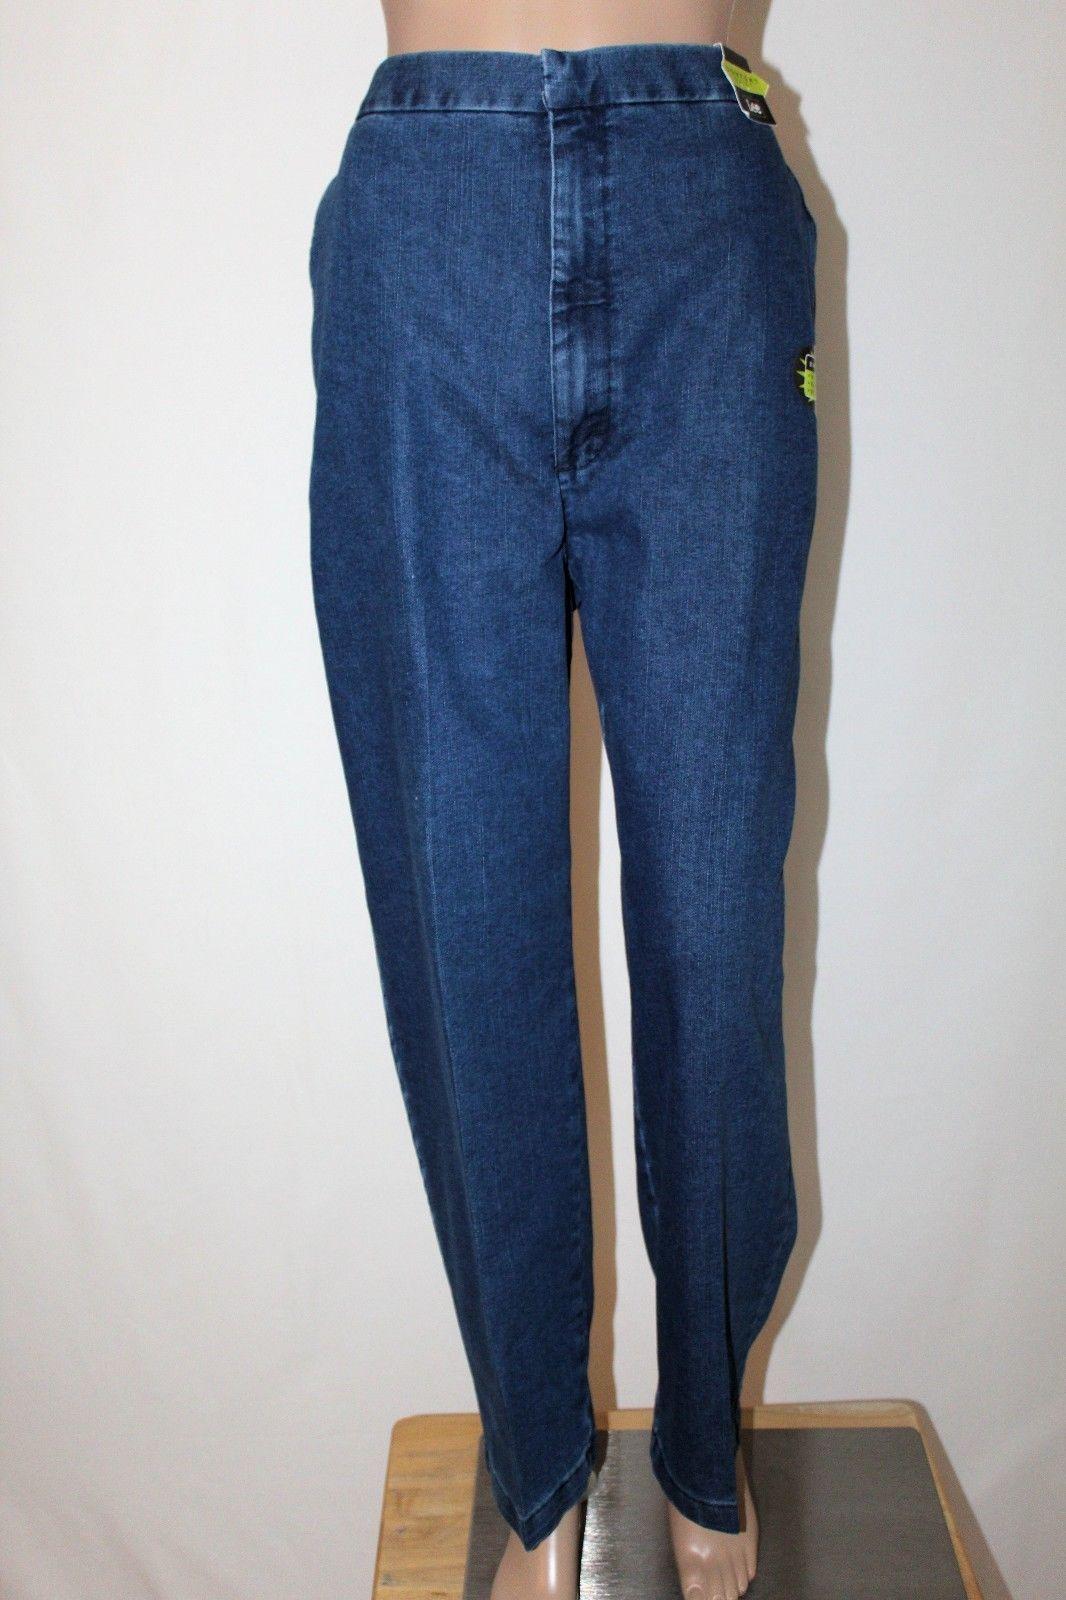 2b66d36b 57. 57. Previous. NWT LEE Feel Good Khakis Women's 18 Short High Waist Side  Elastic Denim Jeans